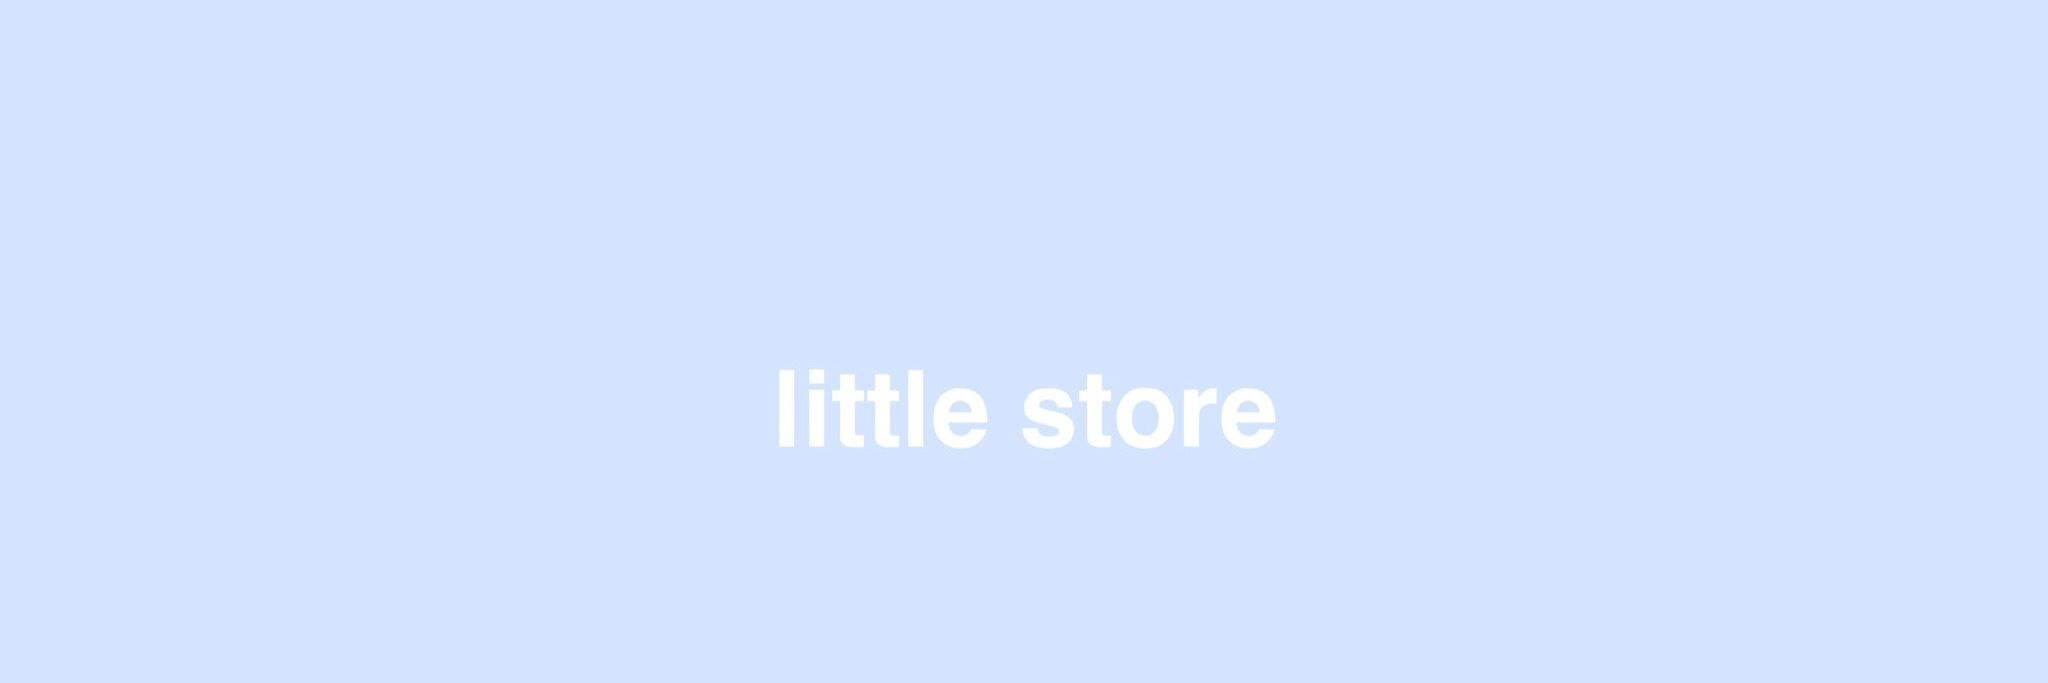 little store